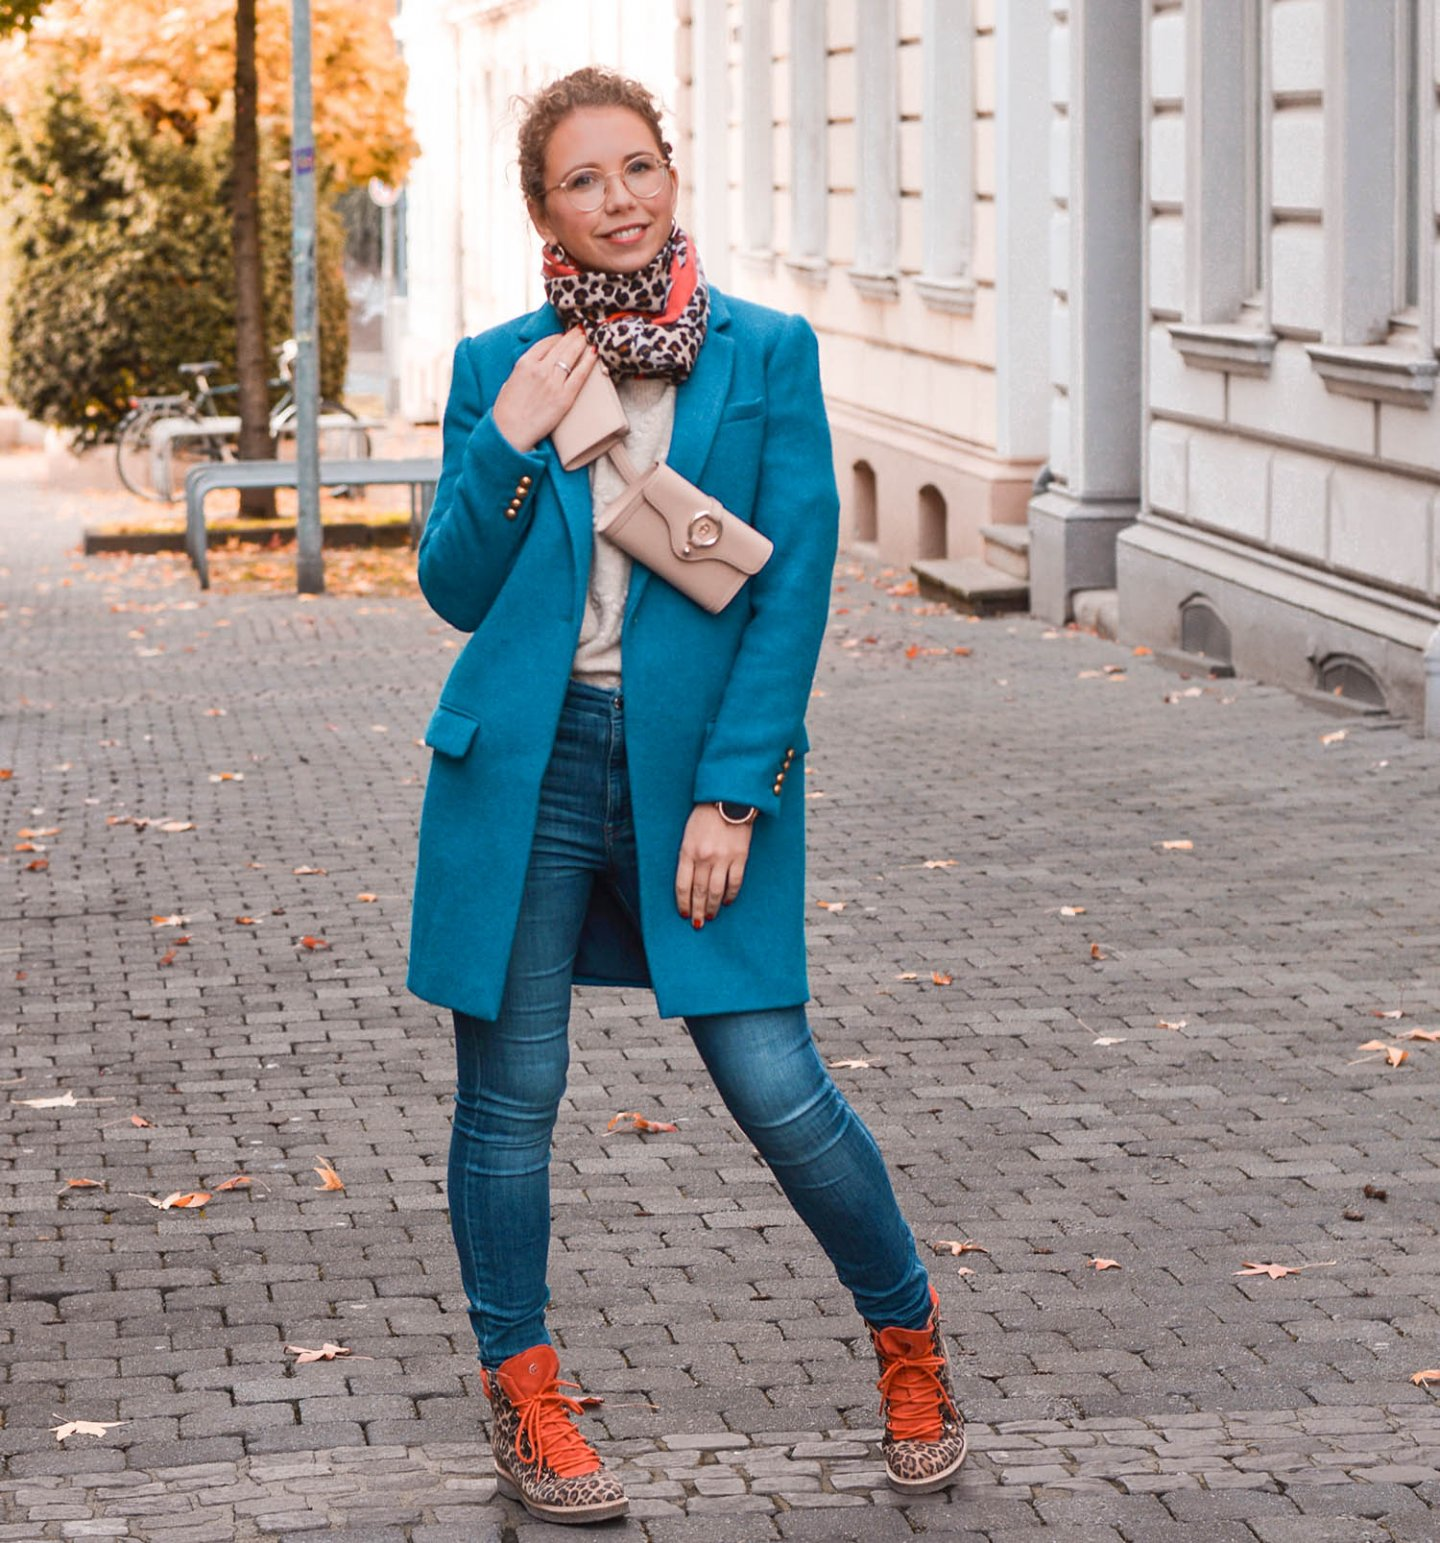 Belt Bags trägt man jetzt crossbody Fashion Trend 2019